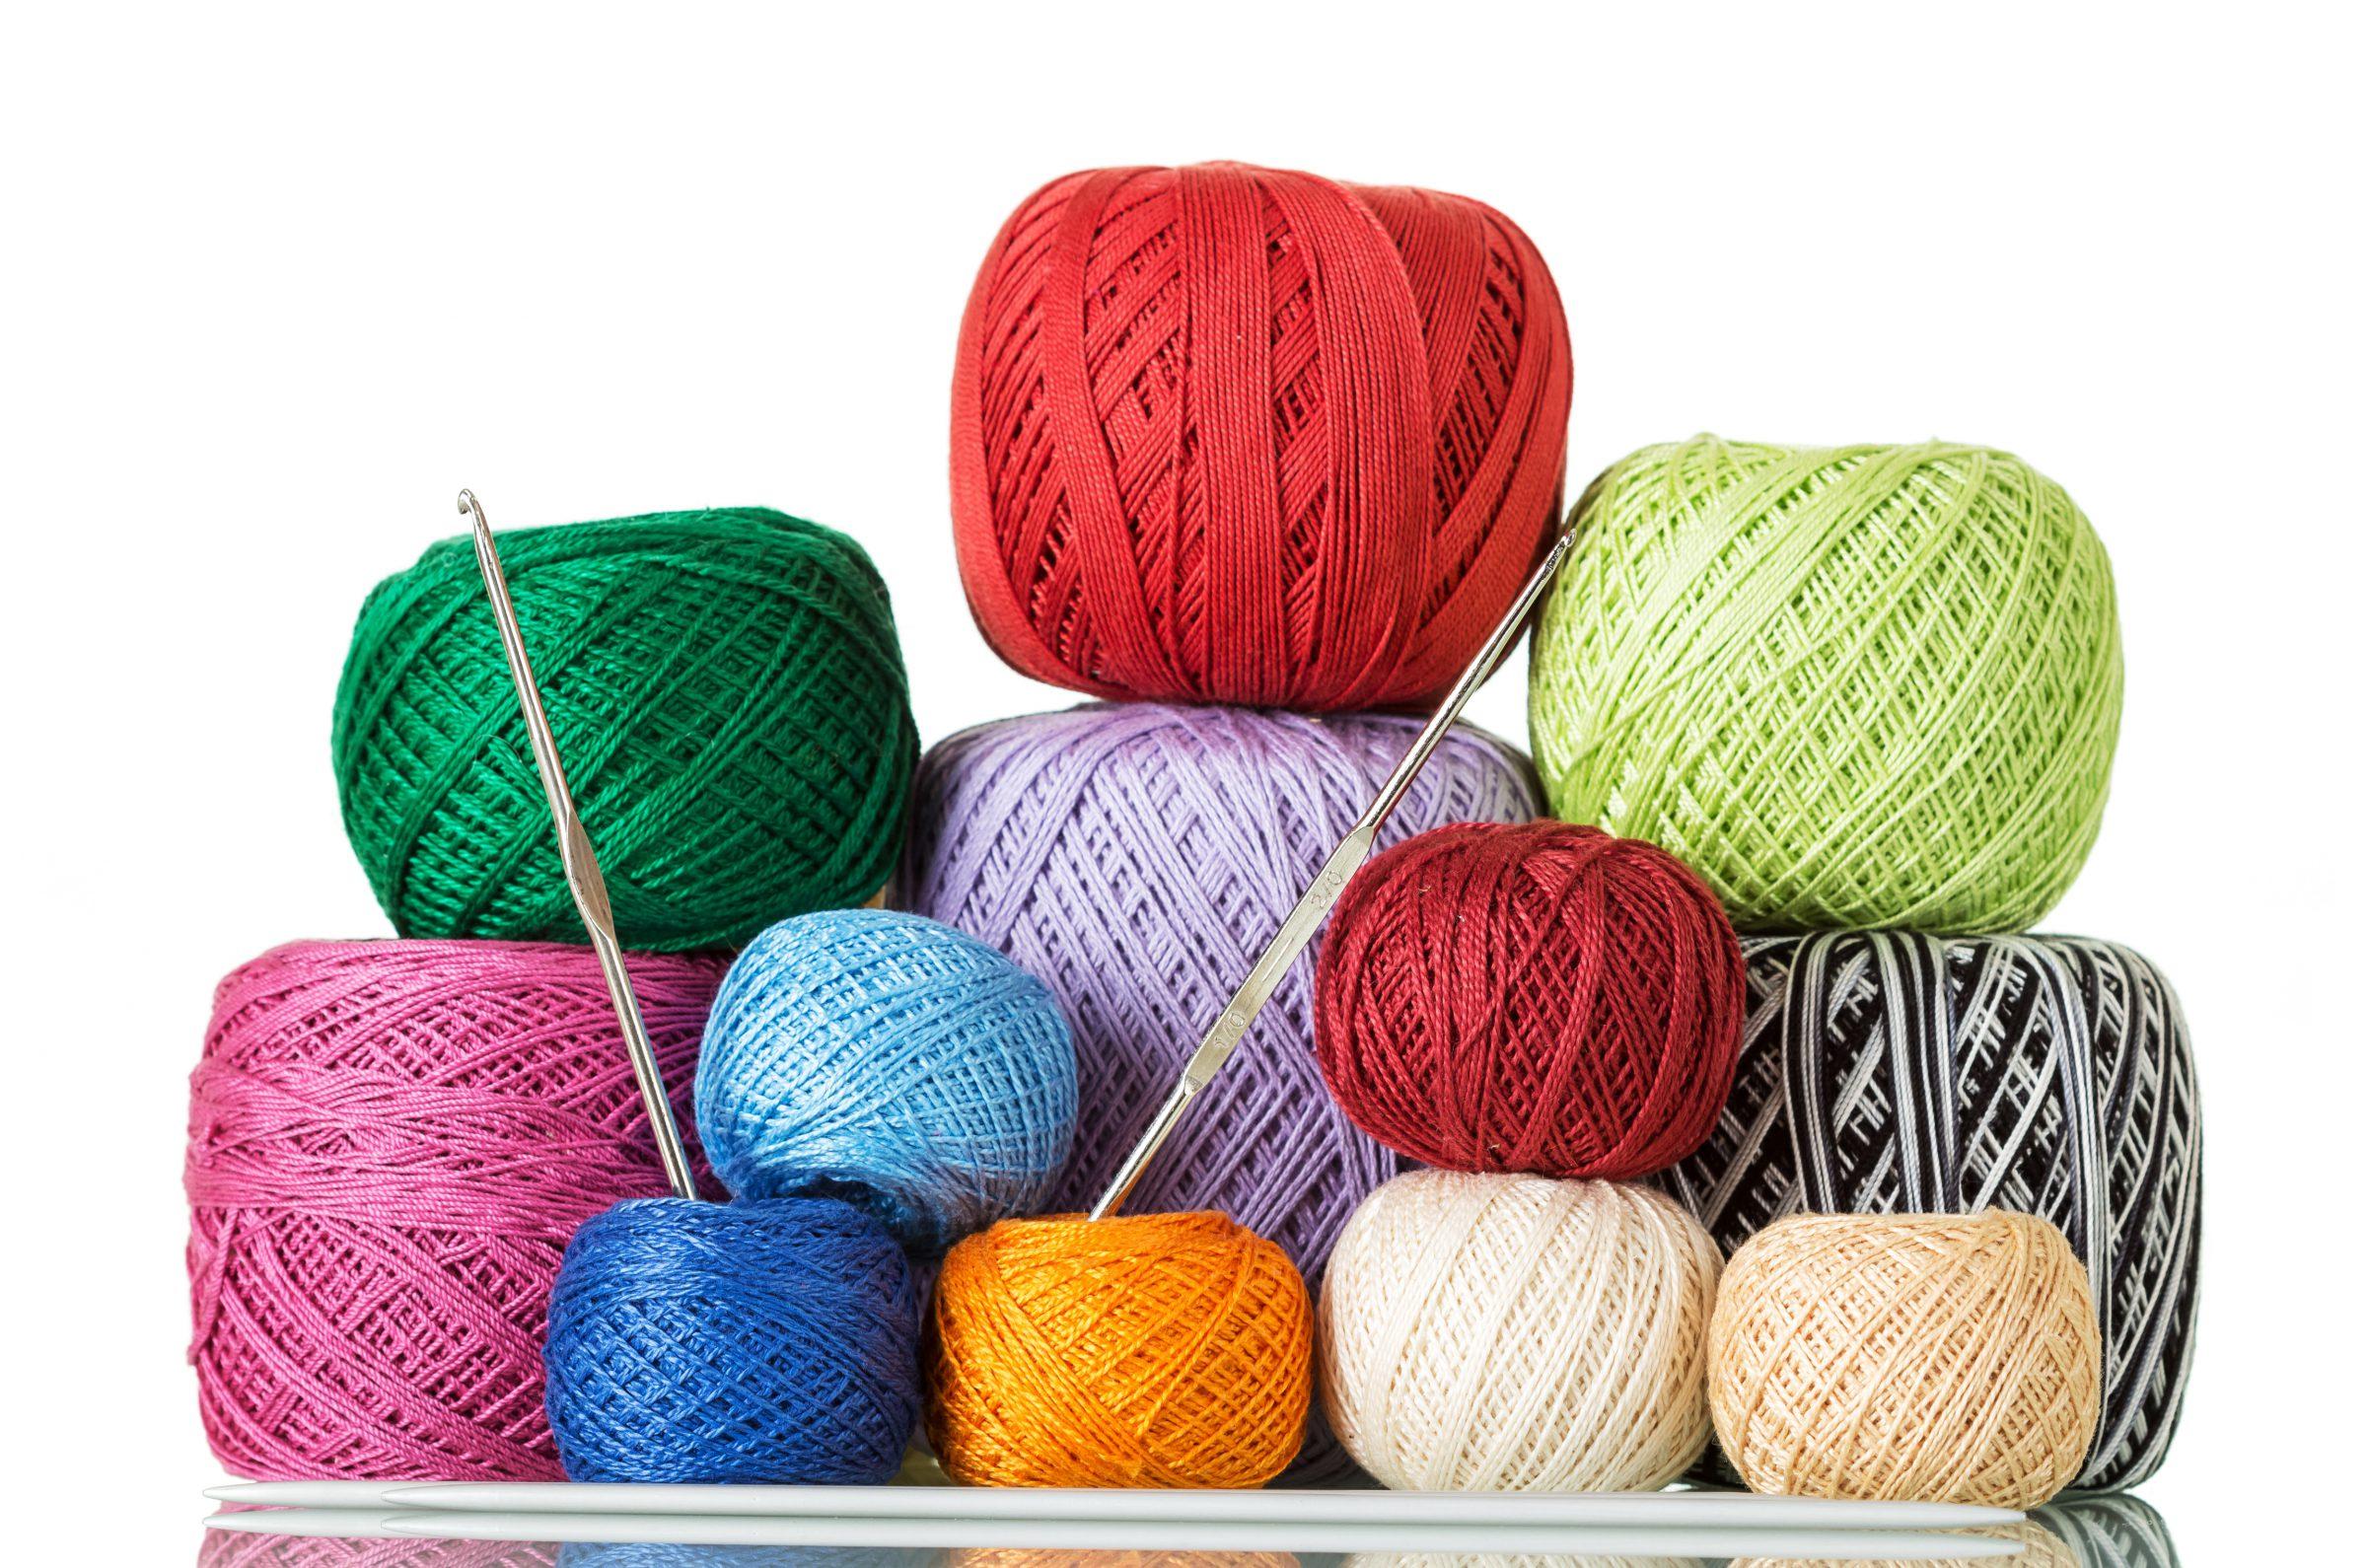 Crochet Thread on white background